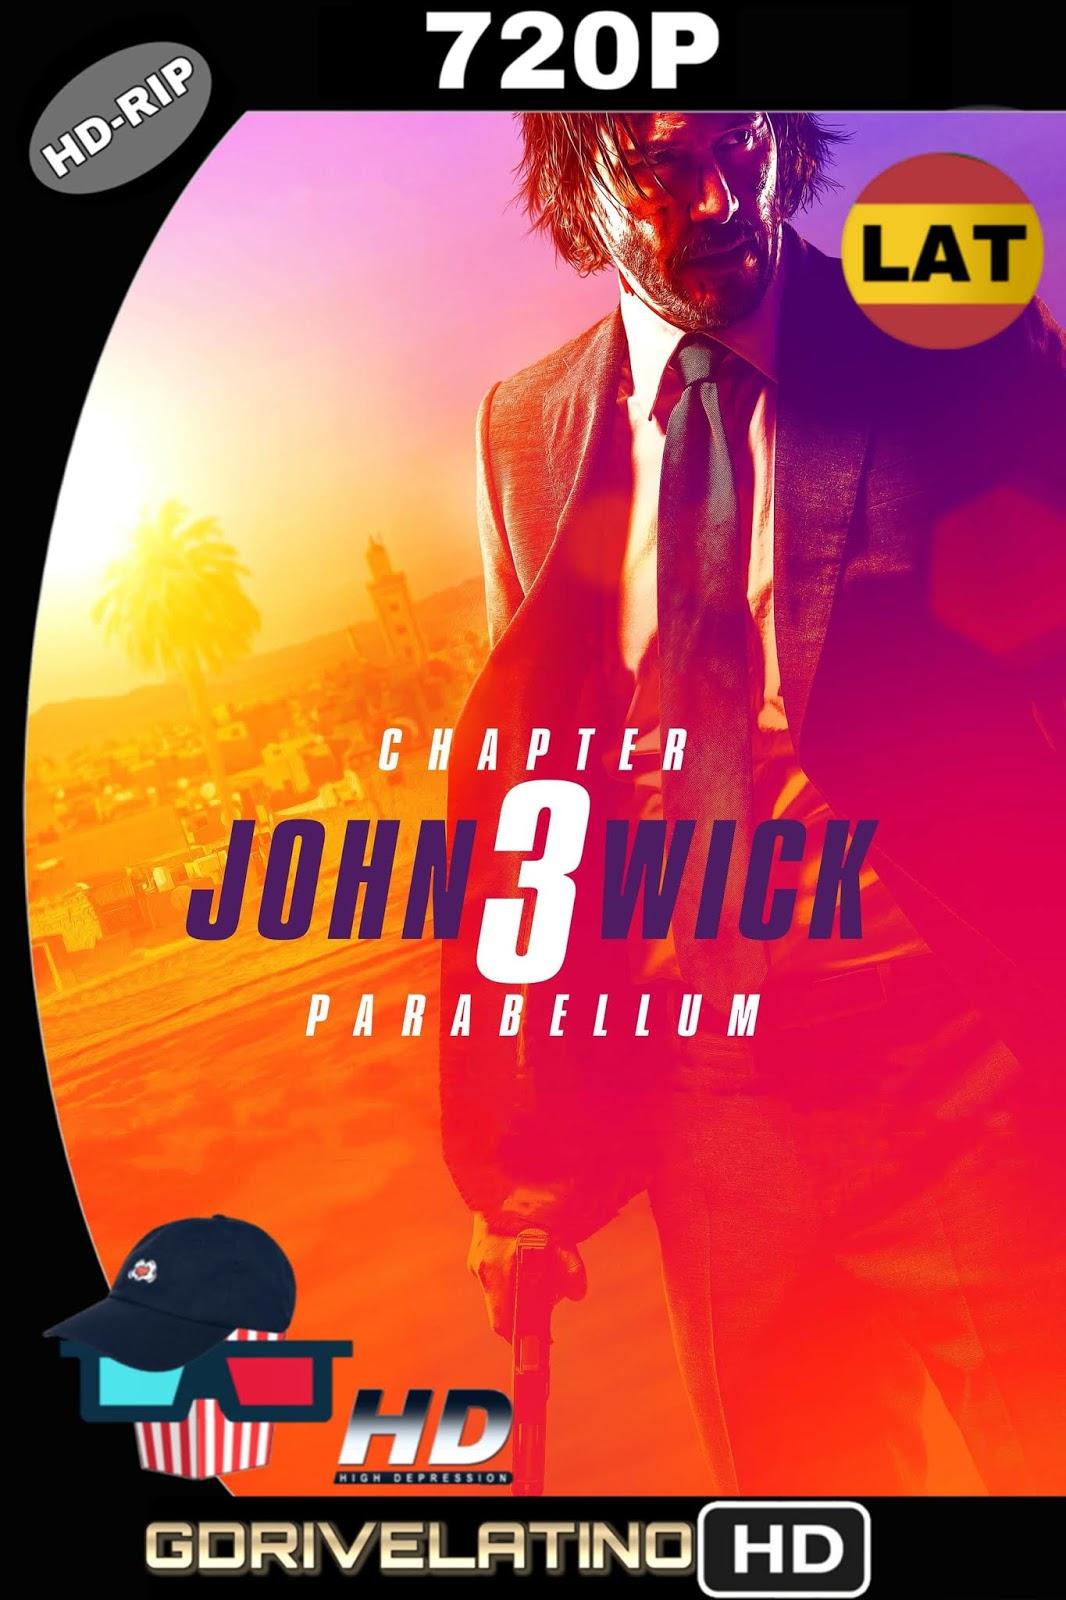 John Wick 3: Parabellum (2019) HDRip 720p (Latino-Inglés) MKV